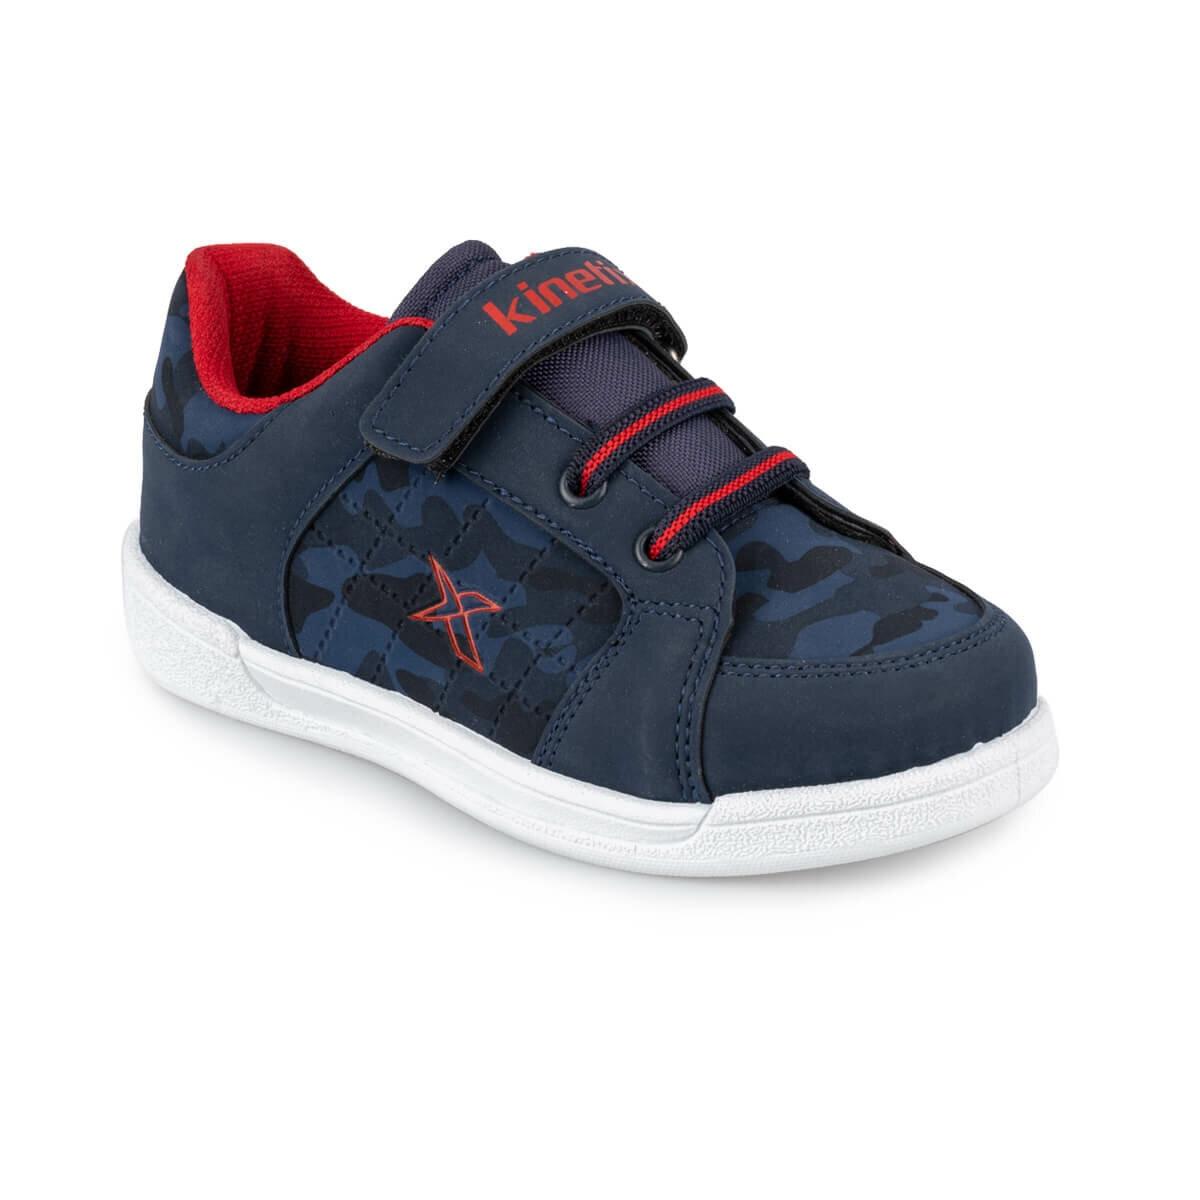 FLO LENKO C 9PR Navy Blue Male Child Sneaker Shoes KINETIX